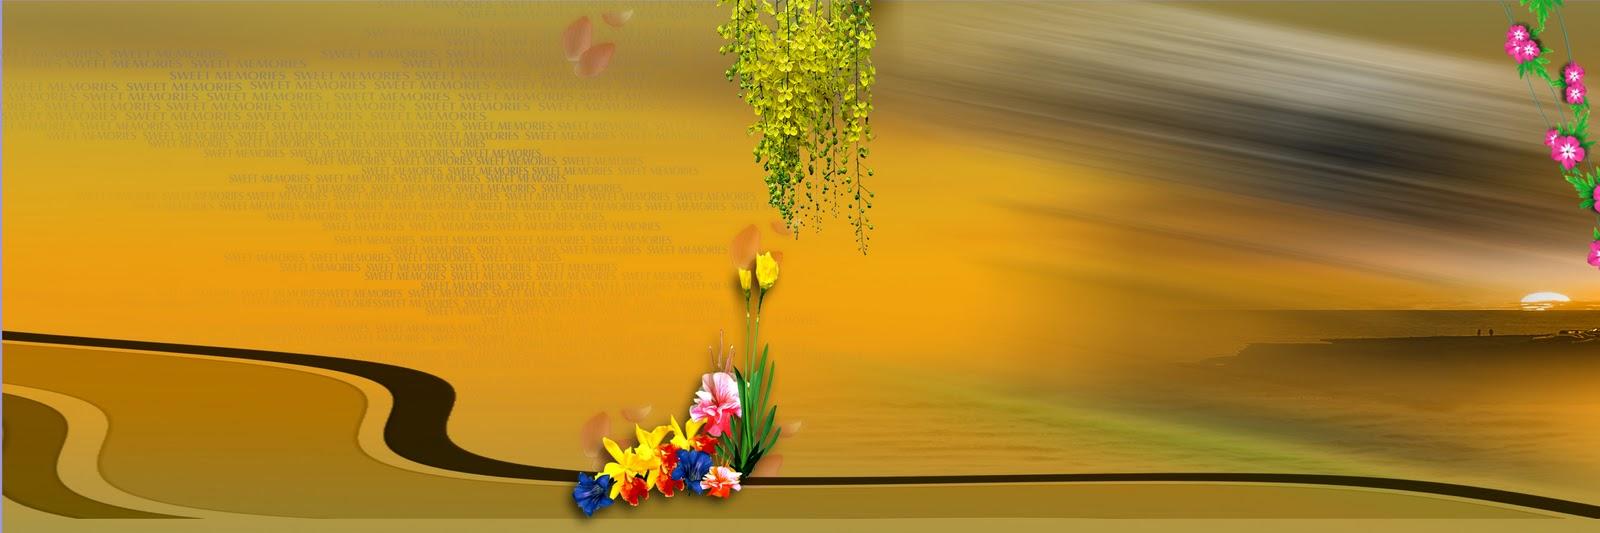 Karizma album hd joy studio design gallery best design - Filename Karishma Album Backgrounds Psd Karishma Album Design Karizma Album Background Frames Karizma Album Design Karizma Album Templates Lovely Wedding